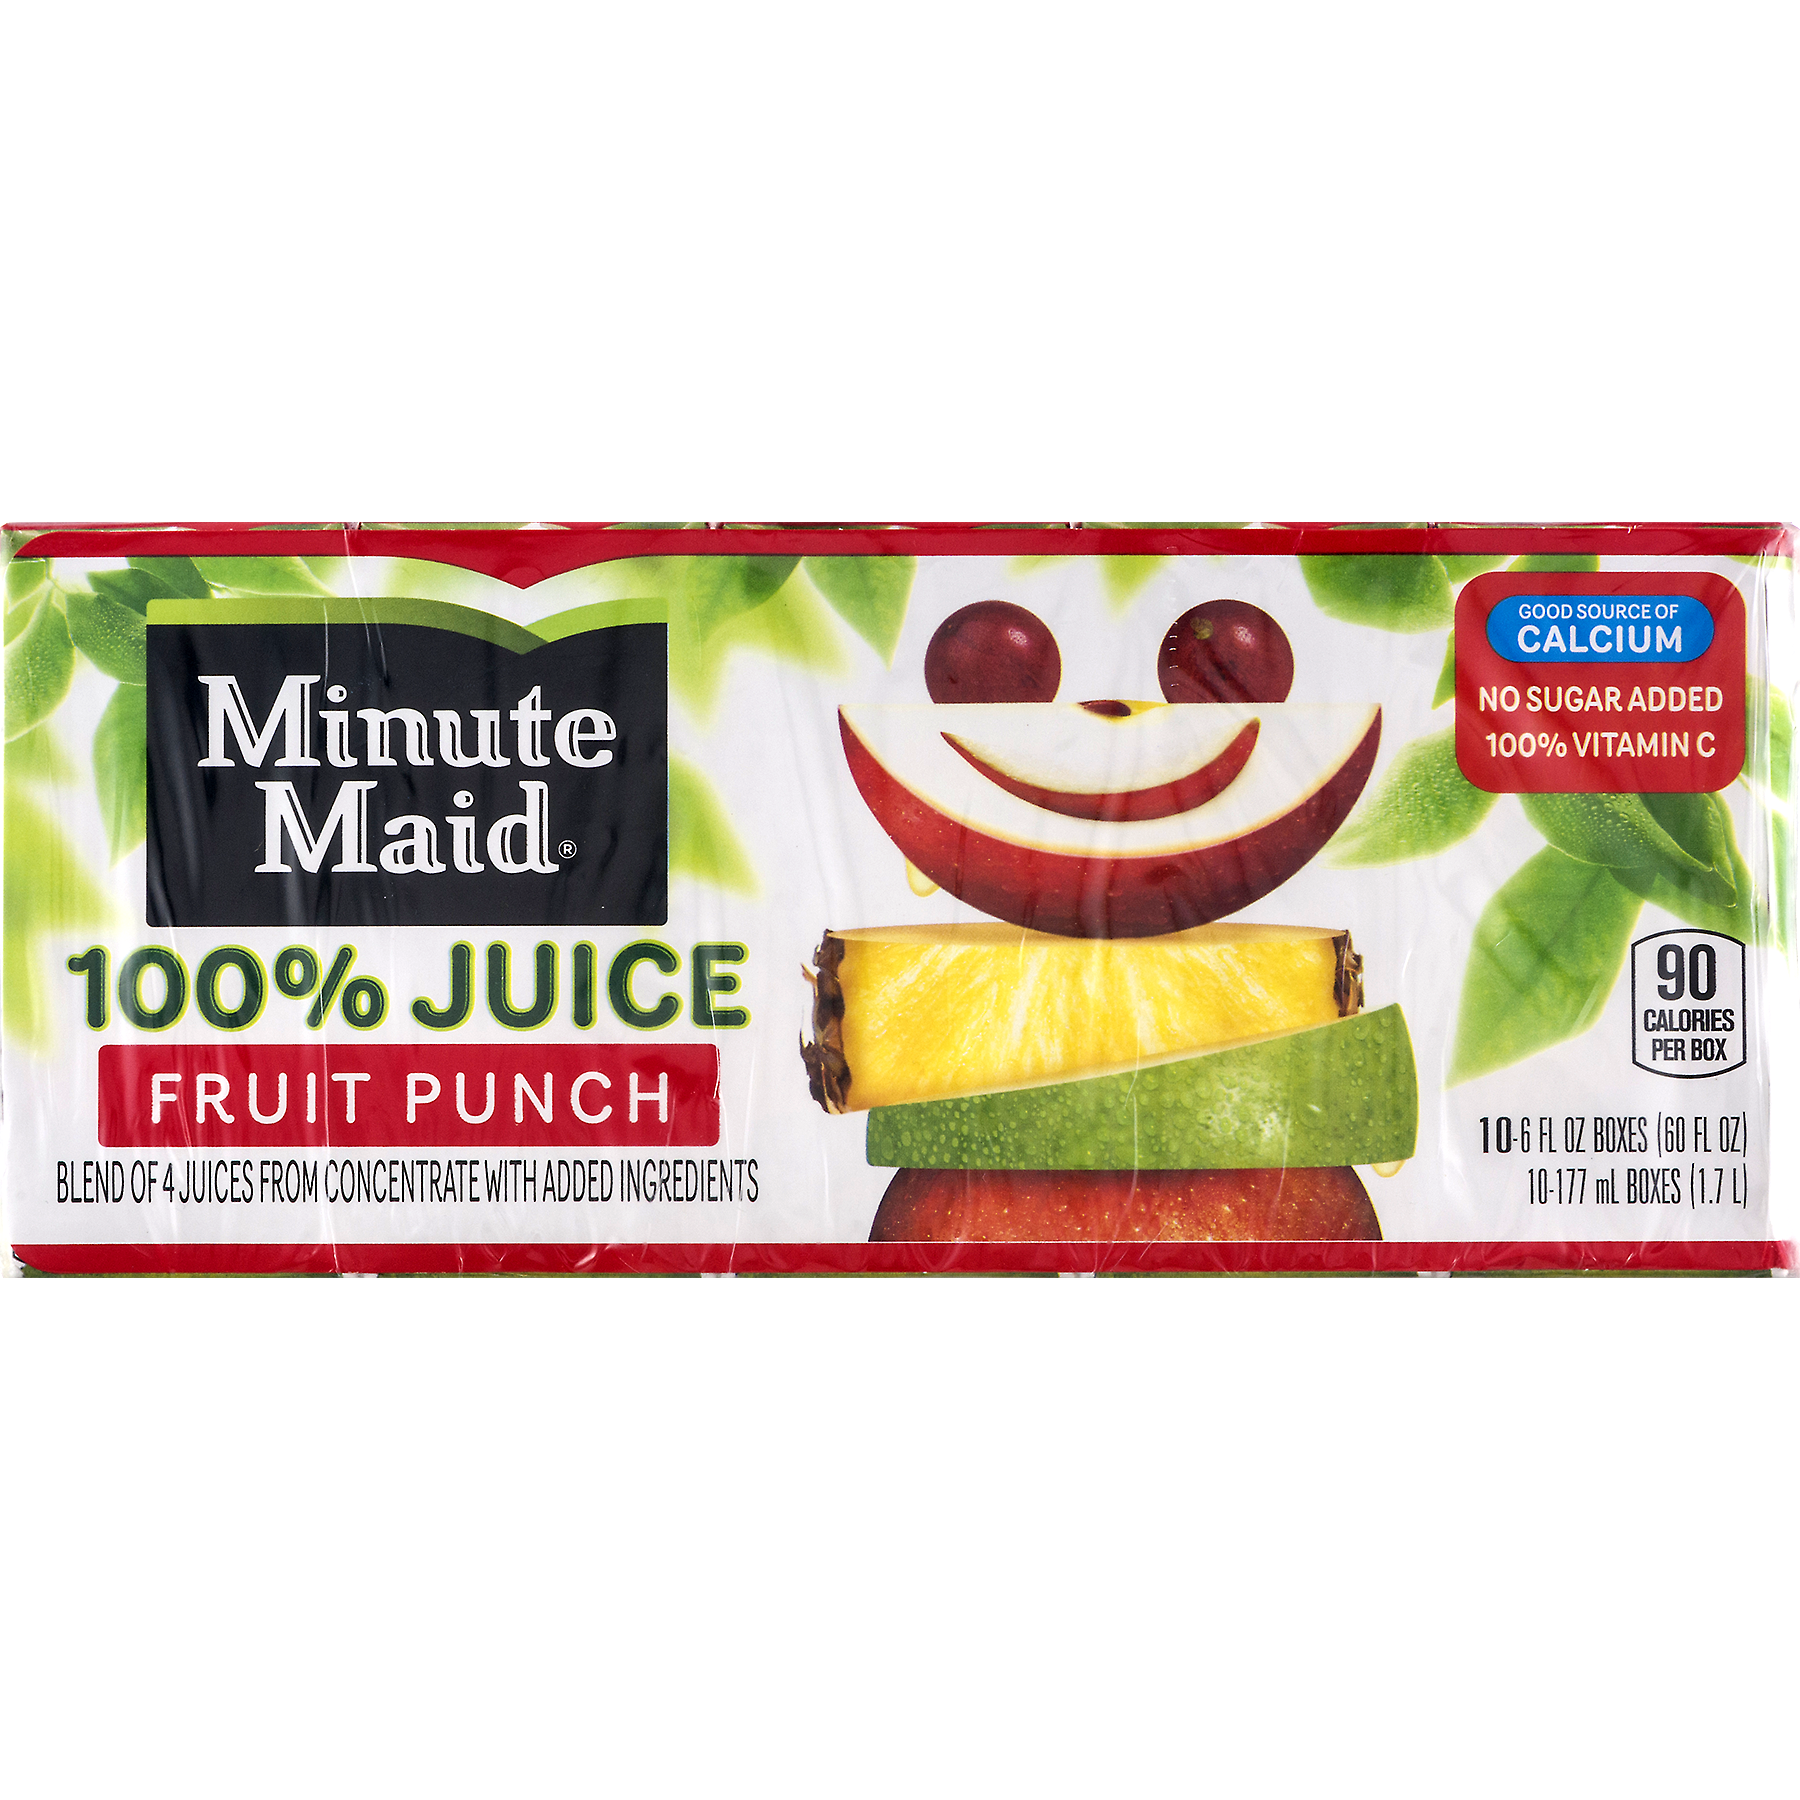 Minute Maid Fruit Punch 100% Juice, 6